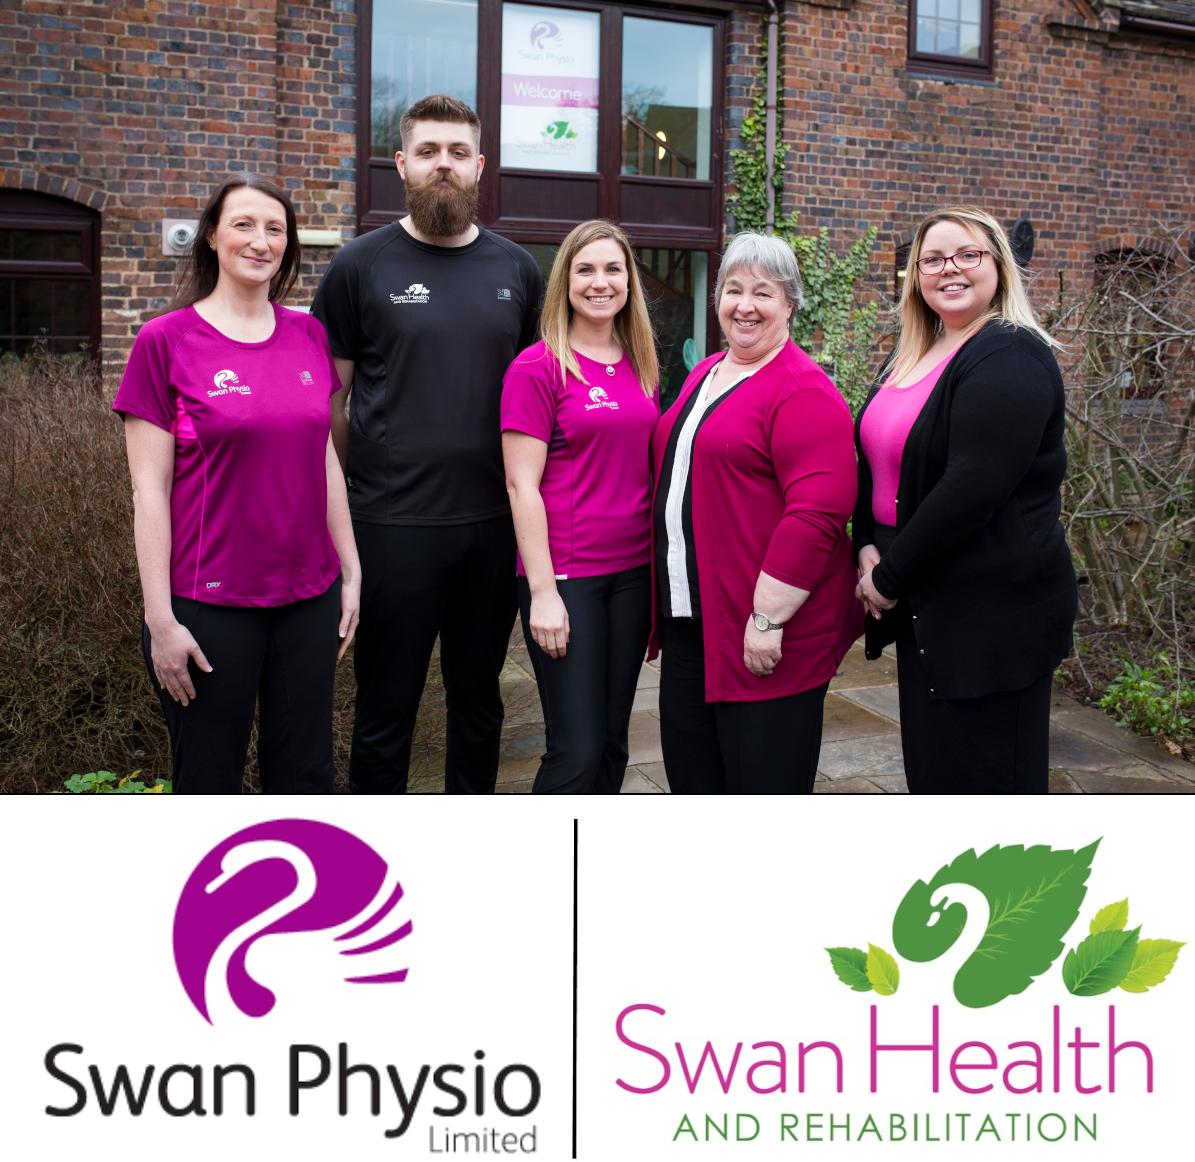 Swan Physio